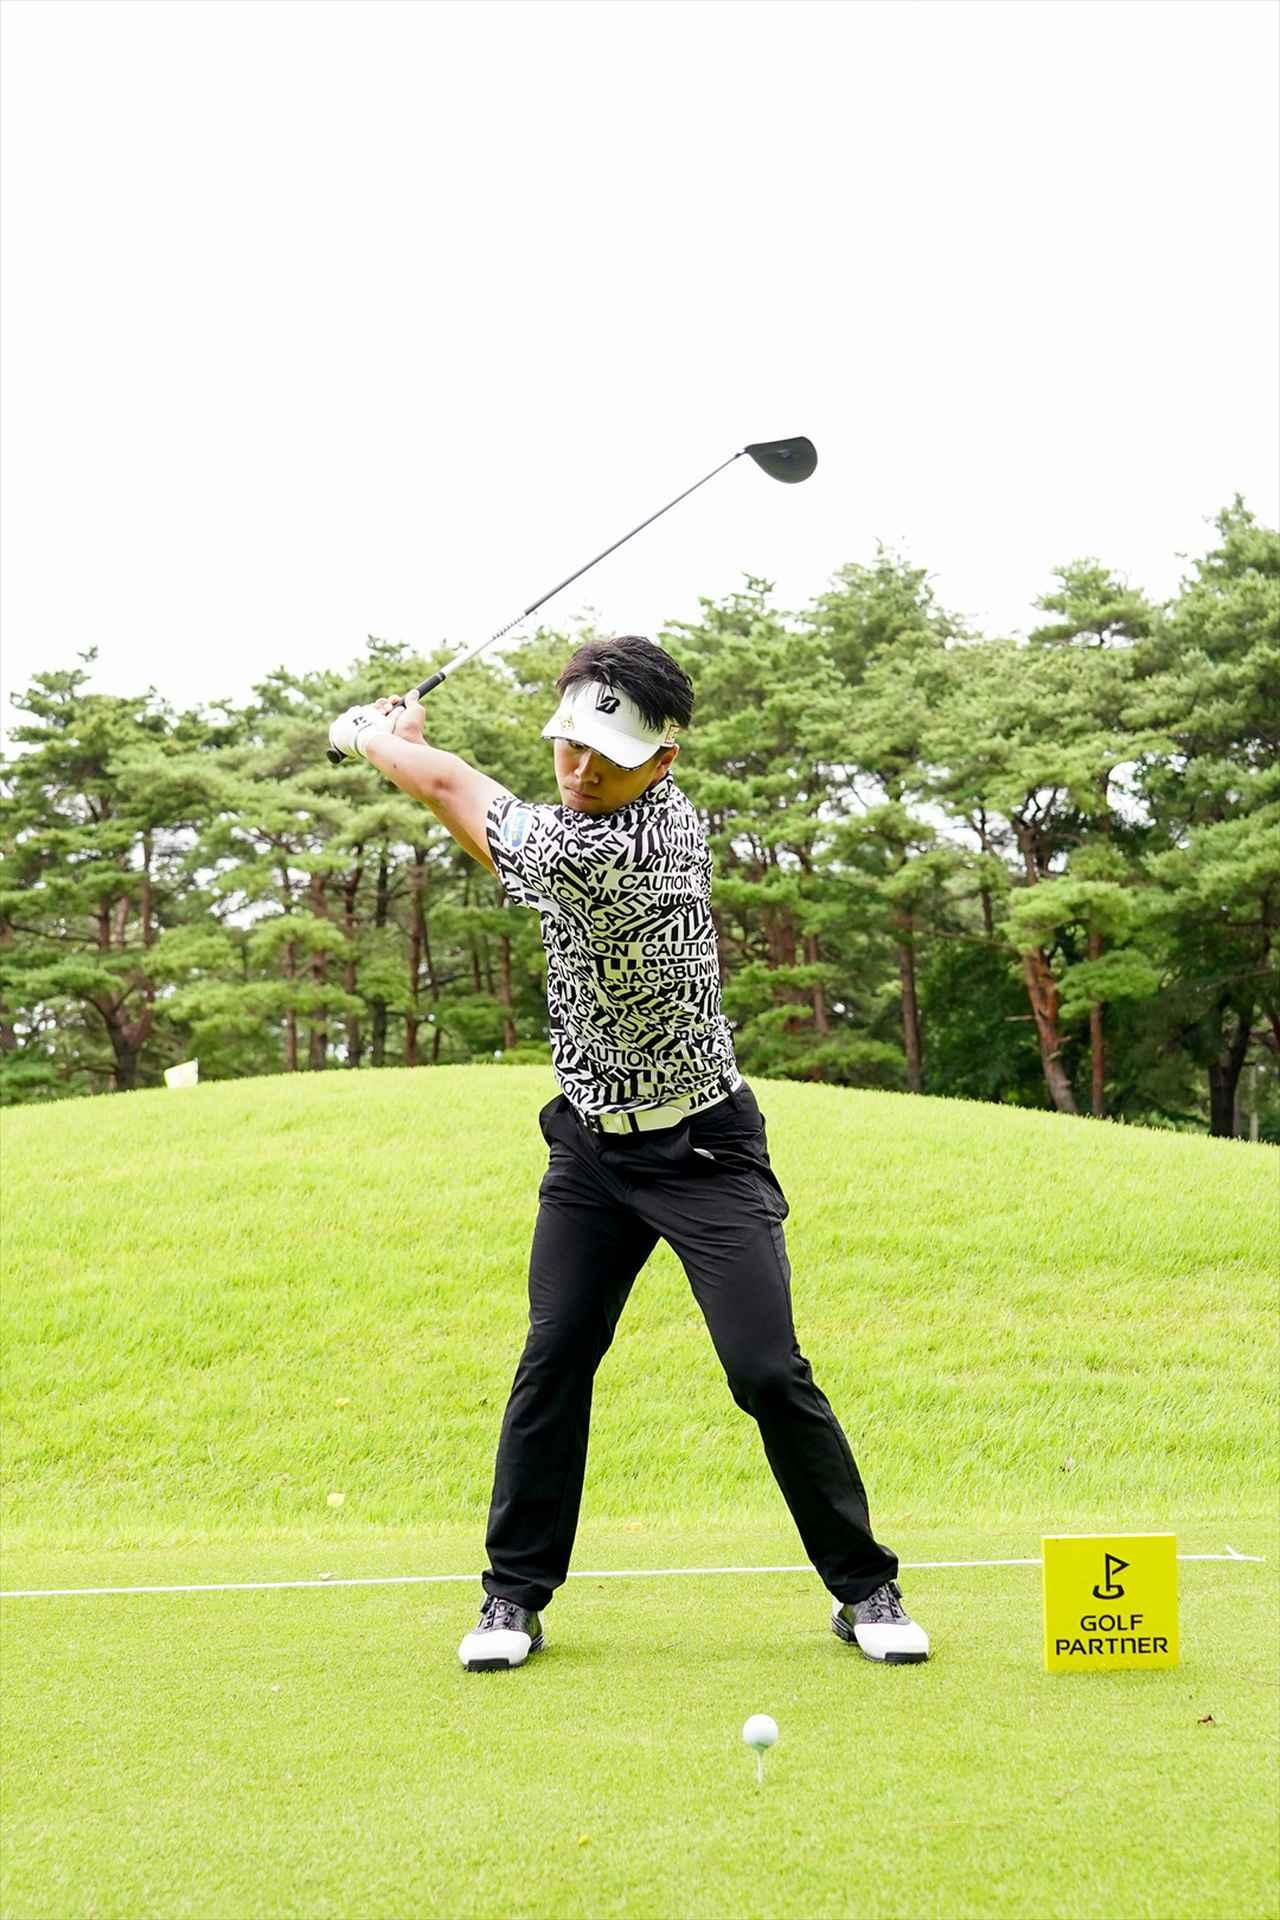 Images : 3番目の画像 - 関藤直煕 ドライバー正面連続写真 - みんなのゴルフダイジェスト